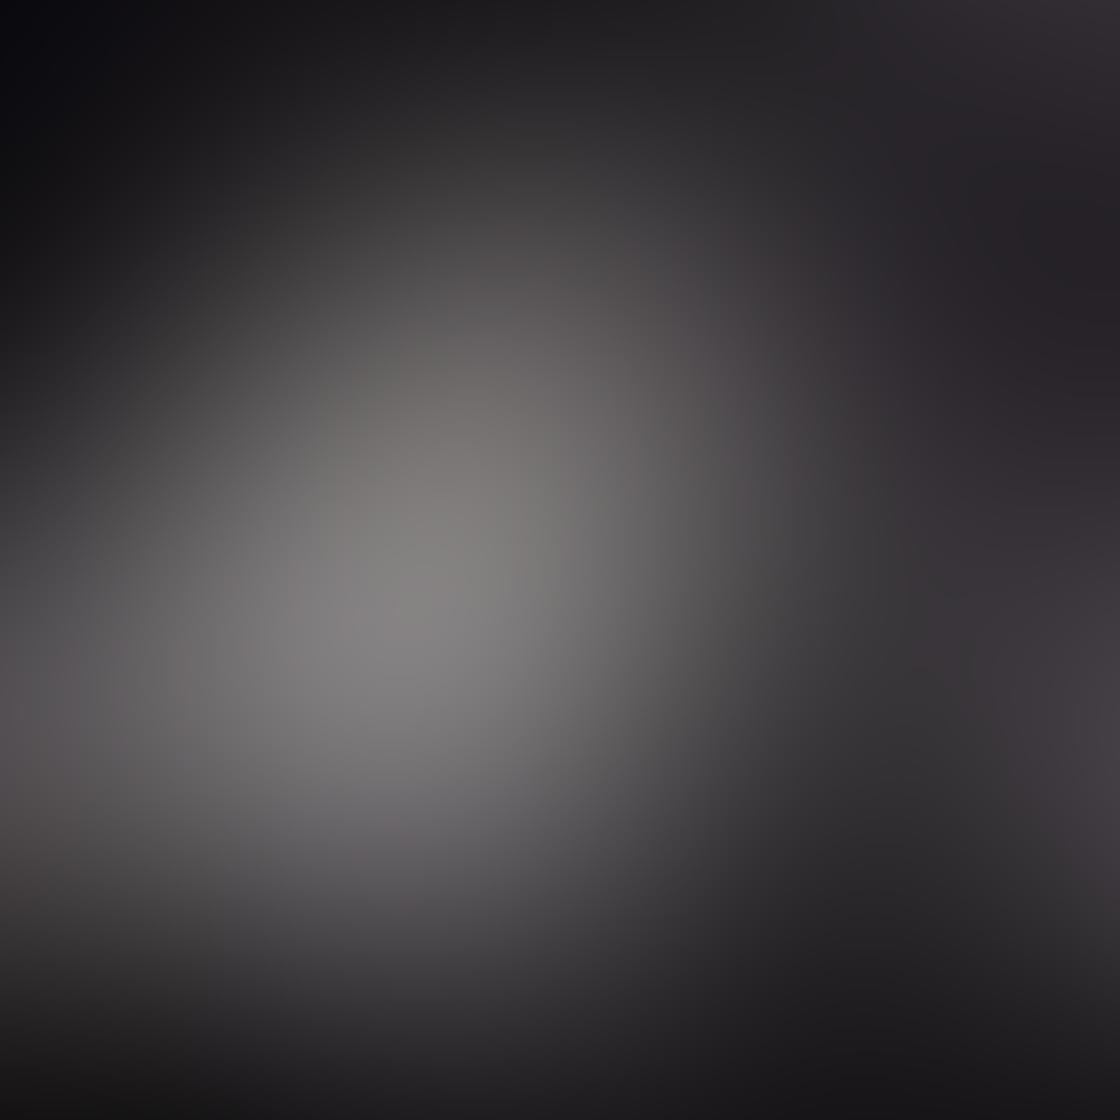 iPhone Silhouette Photos 25